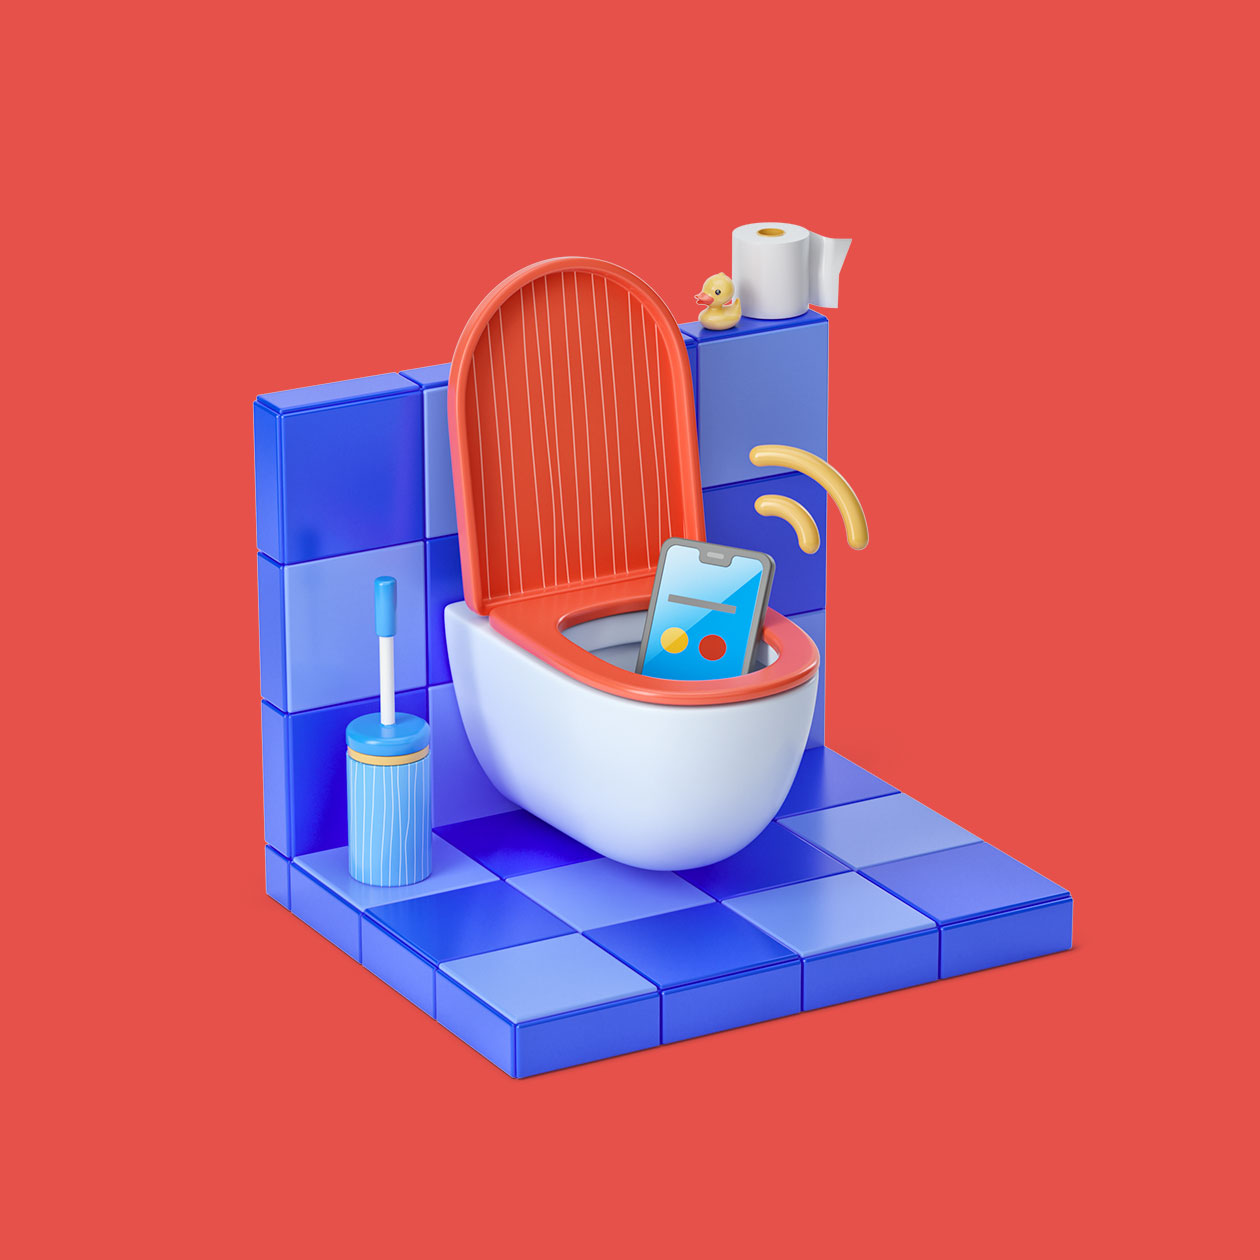 foreal_wakam_toilet